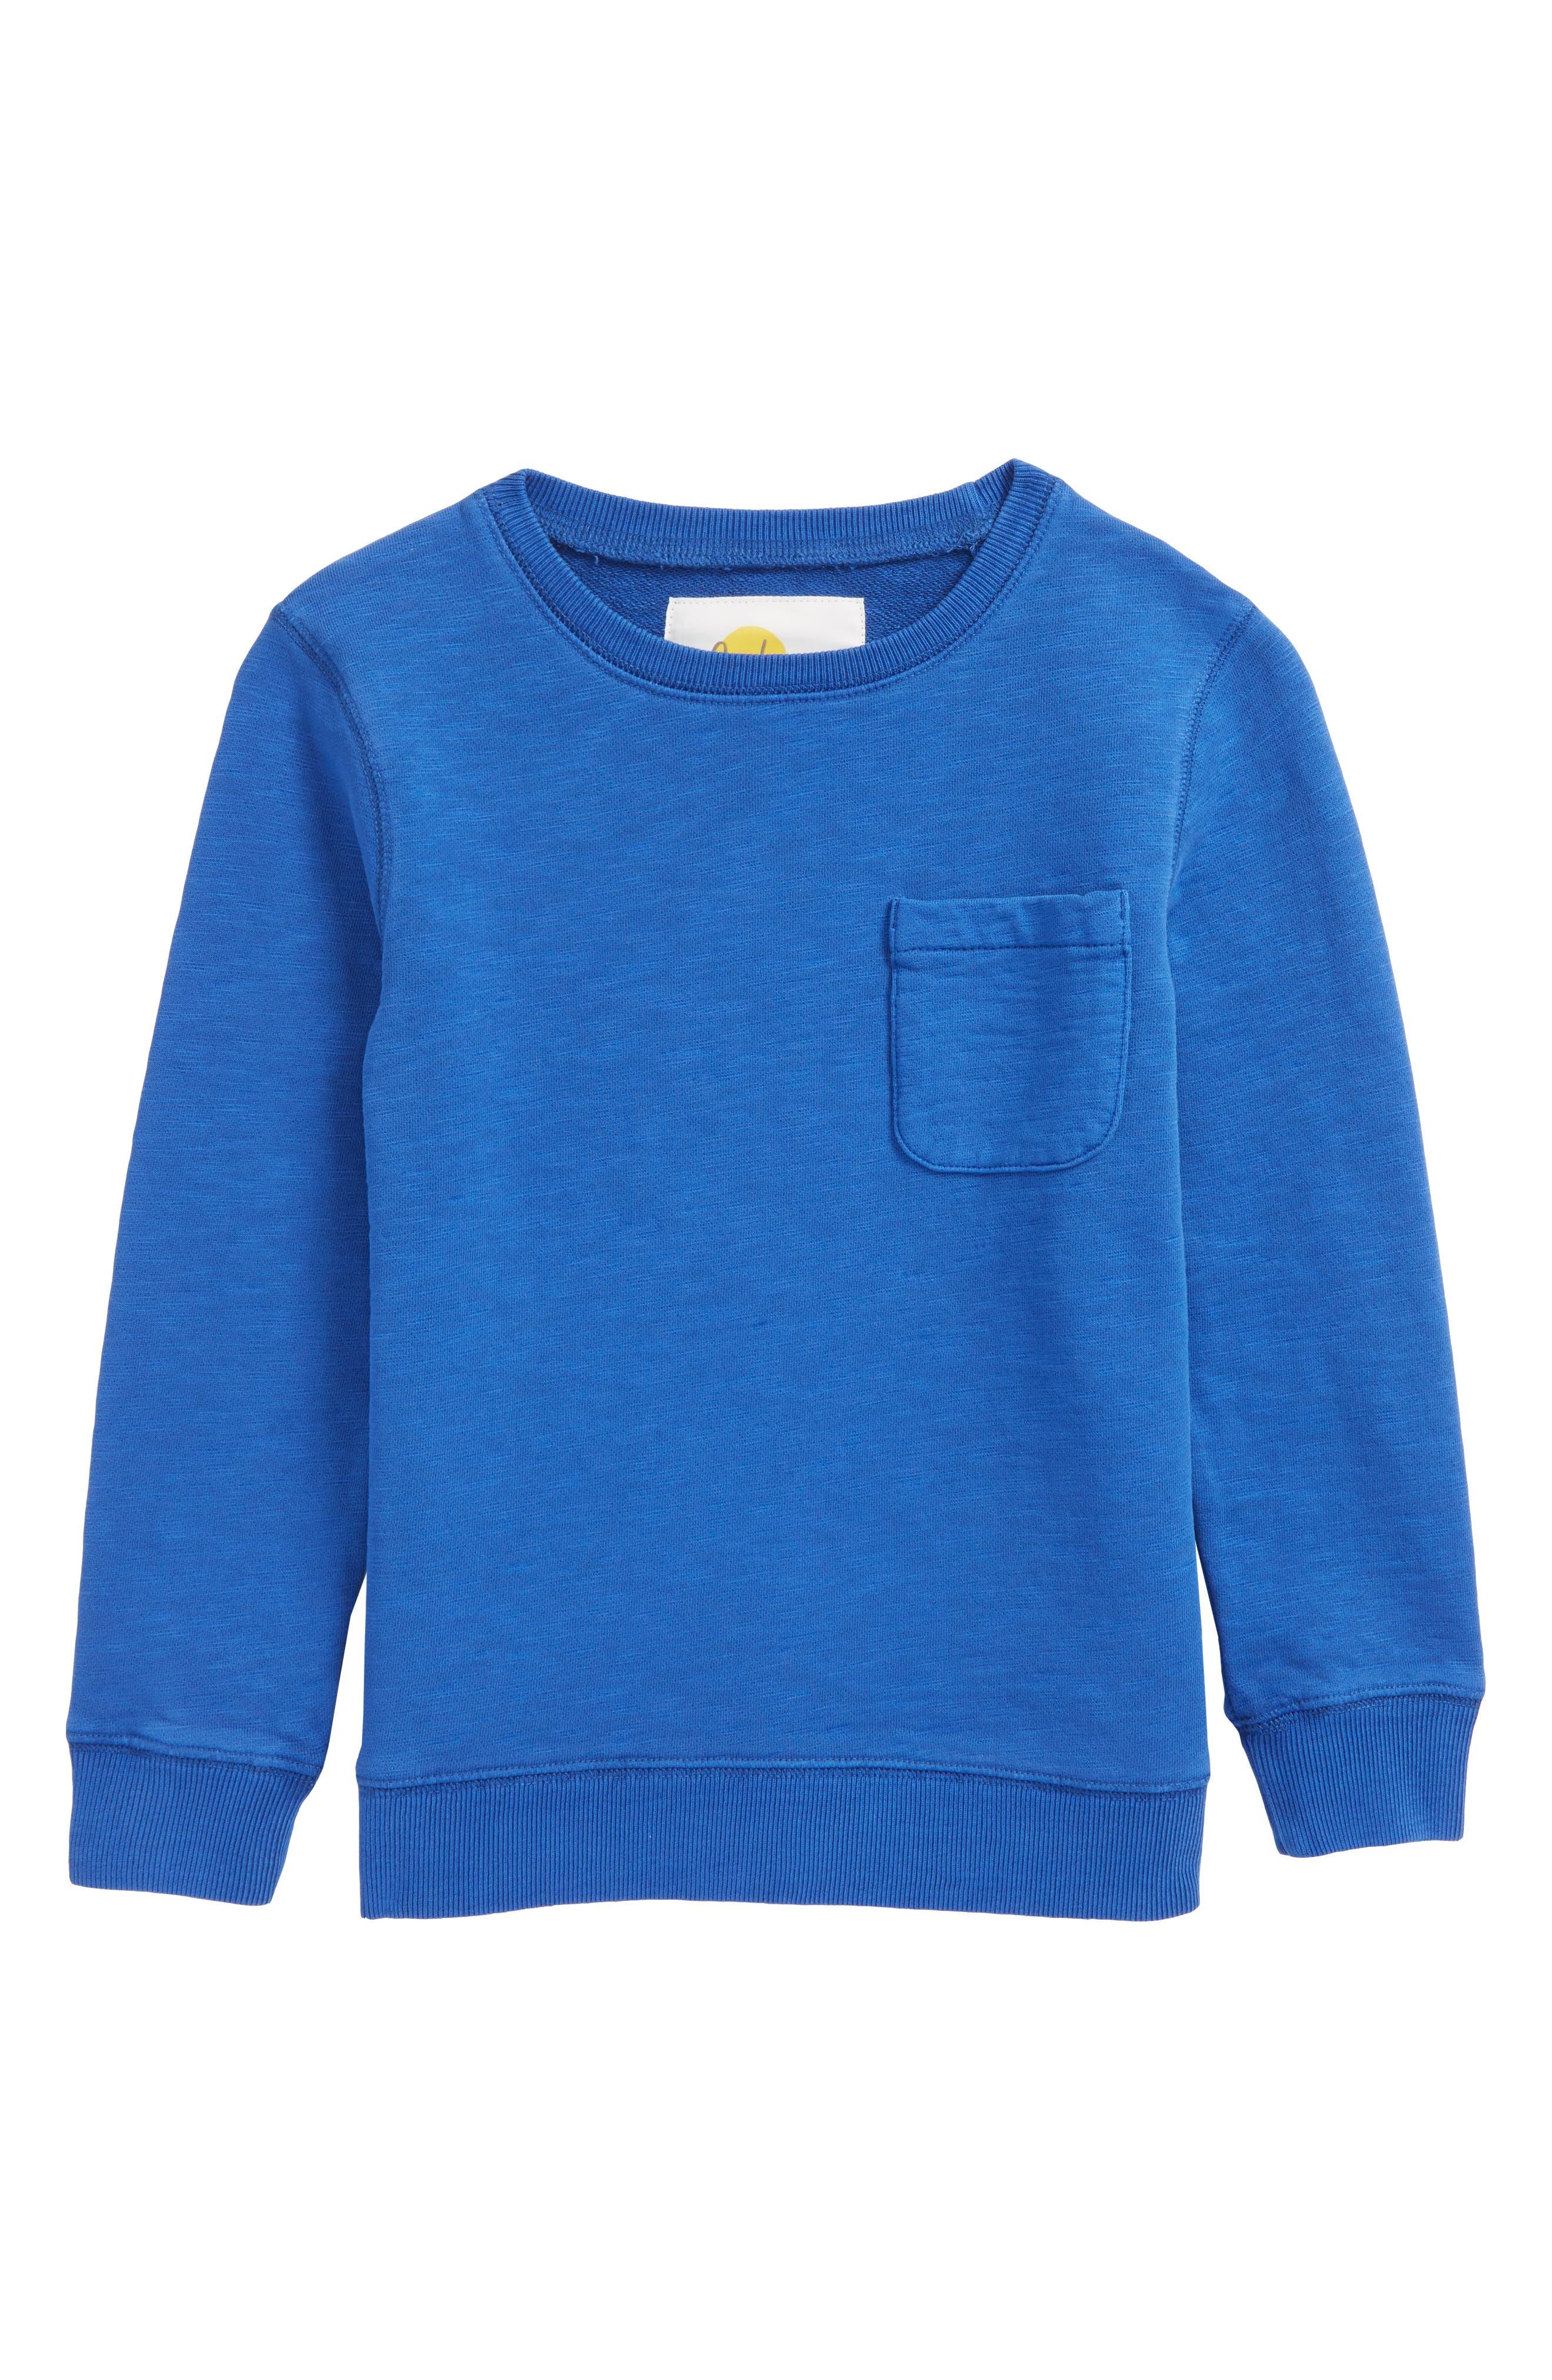 Main Image - Mini Boden Pocket Crewneck Sweatshirt (Toddler Boys, Little Boys & Big Boys)